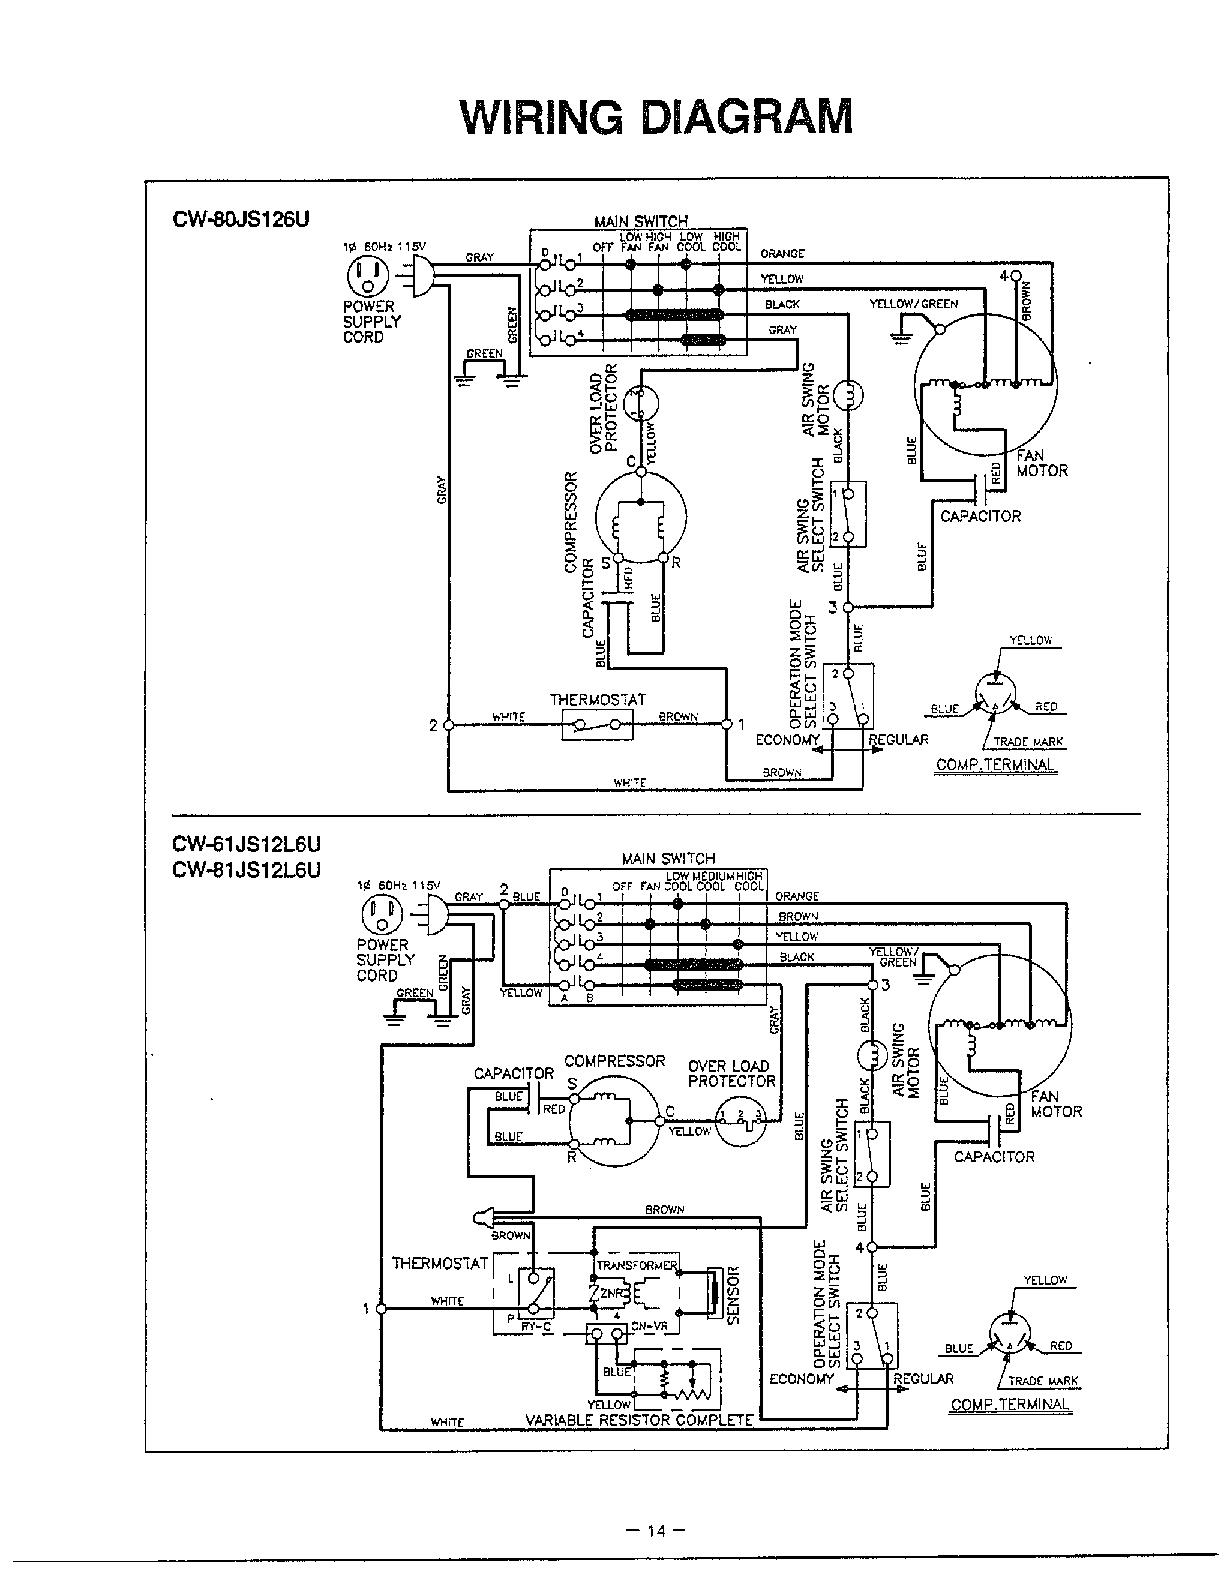 hight resolution of wiring diagram panasonic manual e book panasonic air conditioning wiring diagram